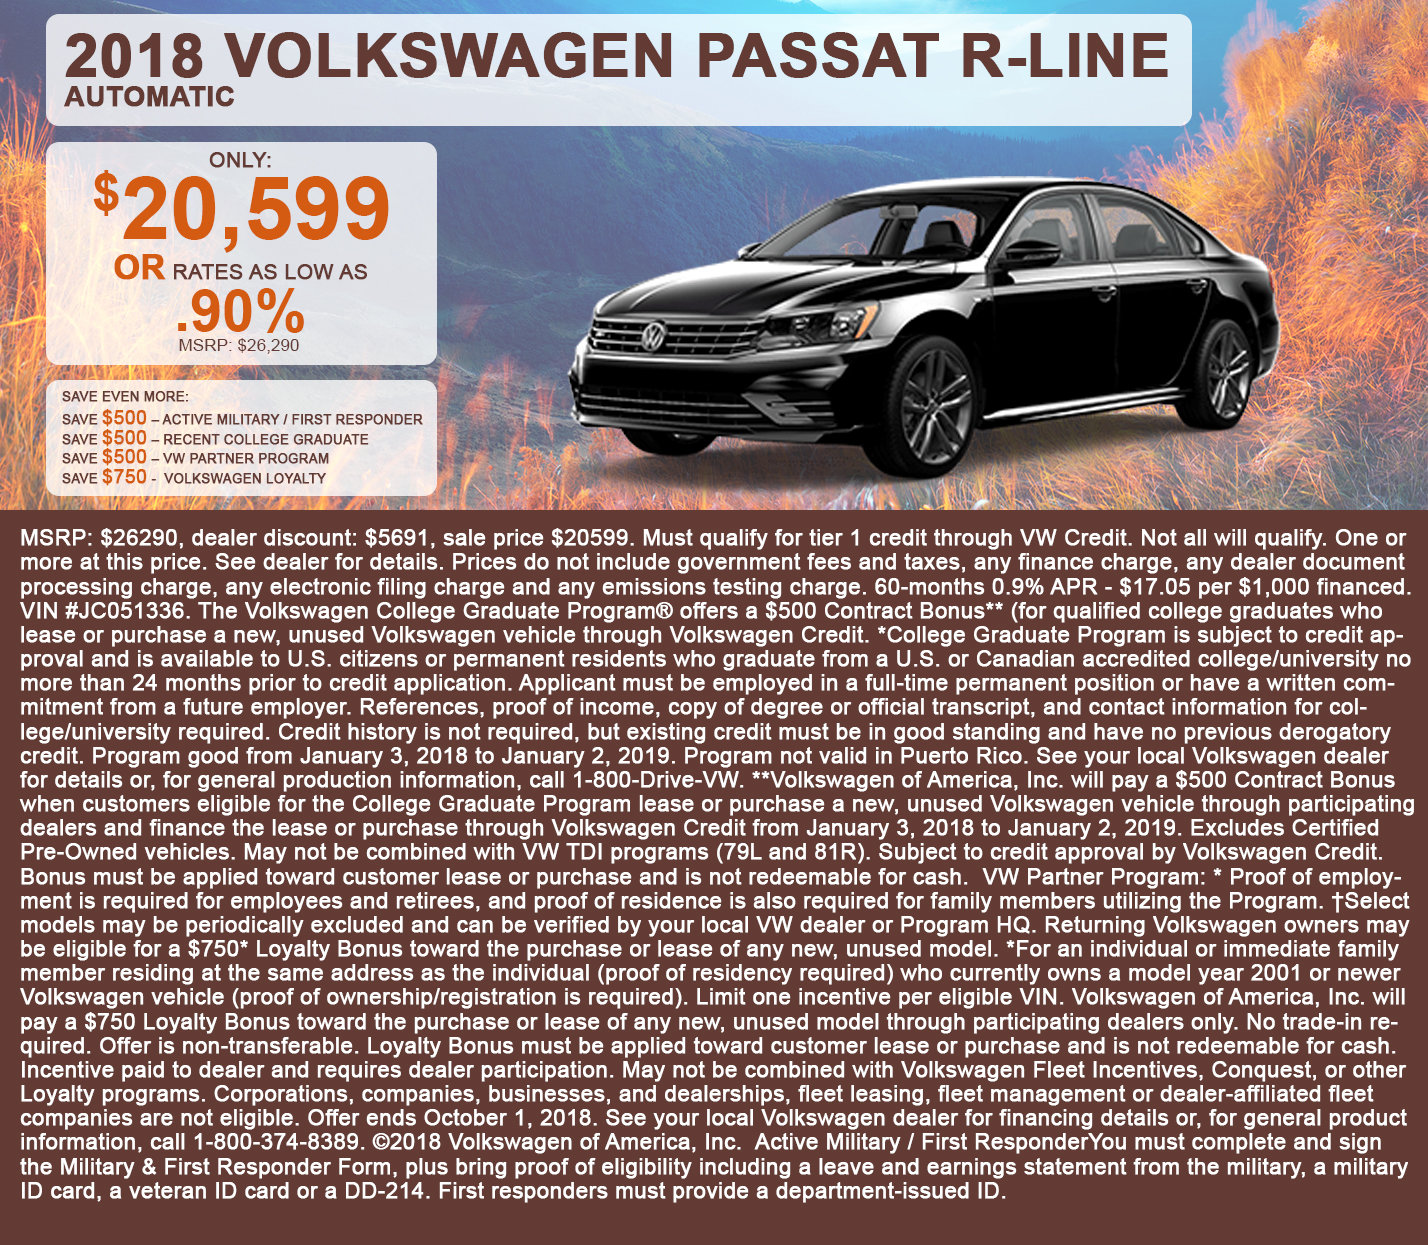 2018 Volkswagen Passat R-Line Automatic